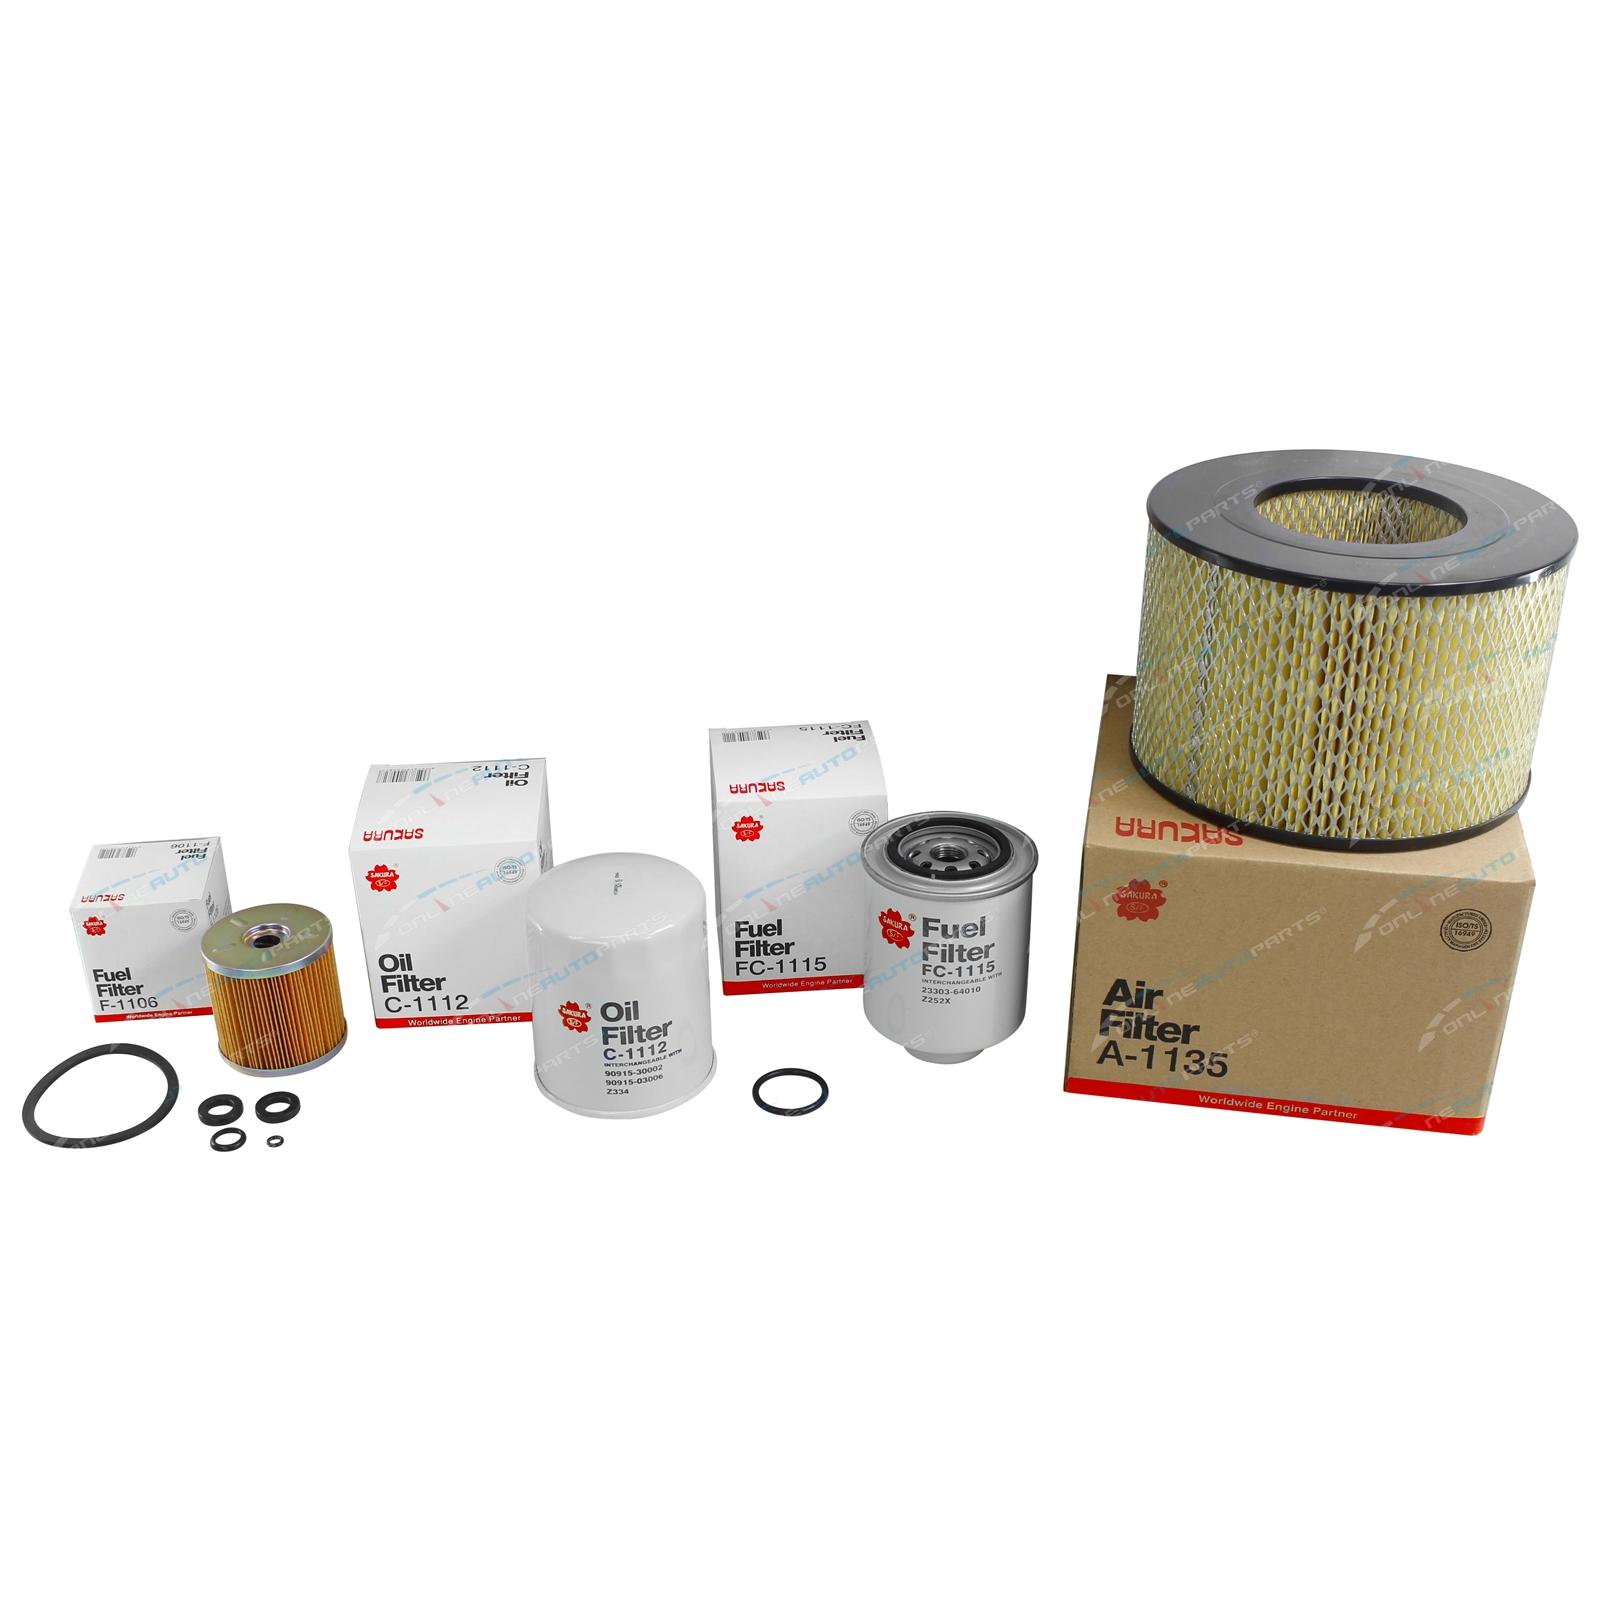 Sakura Air Oil & Fuel Filter Kit suits Landcruiser HDJ79R 6cyl 4 2L 1HD-FTE  2001 2002 2003 2004 2005 2006 2007 Toyota